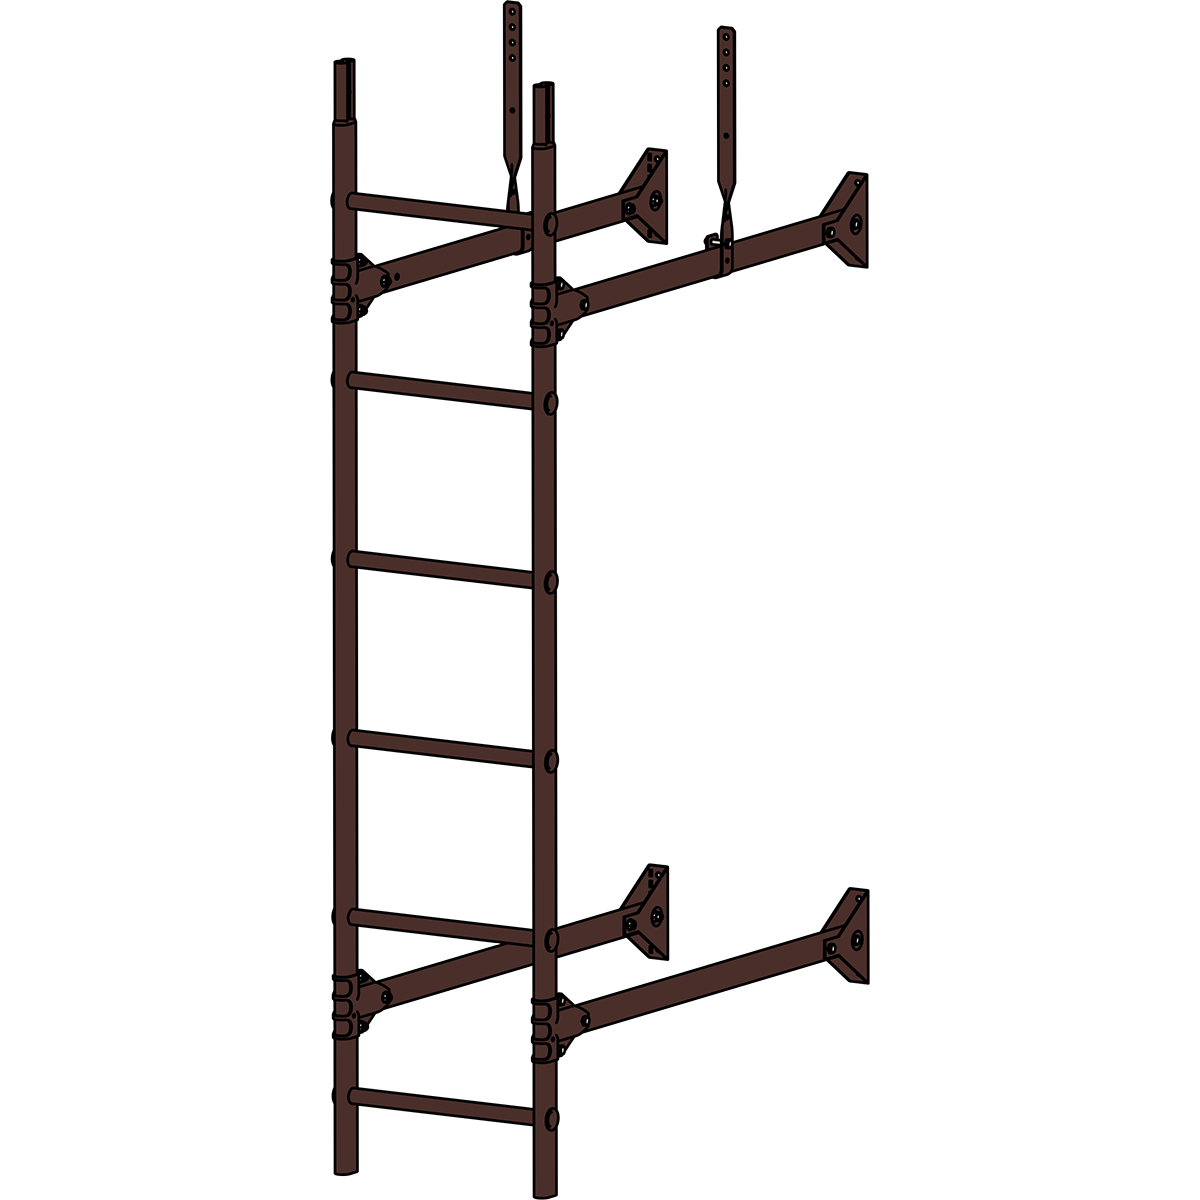 Лестница стеновая ROOFSYSTEMS PRESTIGE ZN 1,2 м RAL 8017 Коричневый шоколад